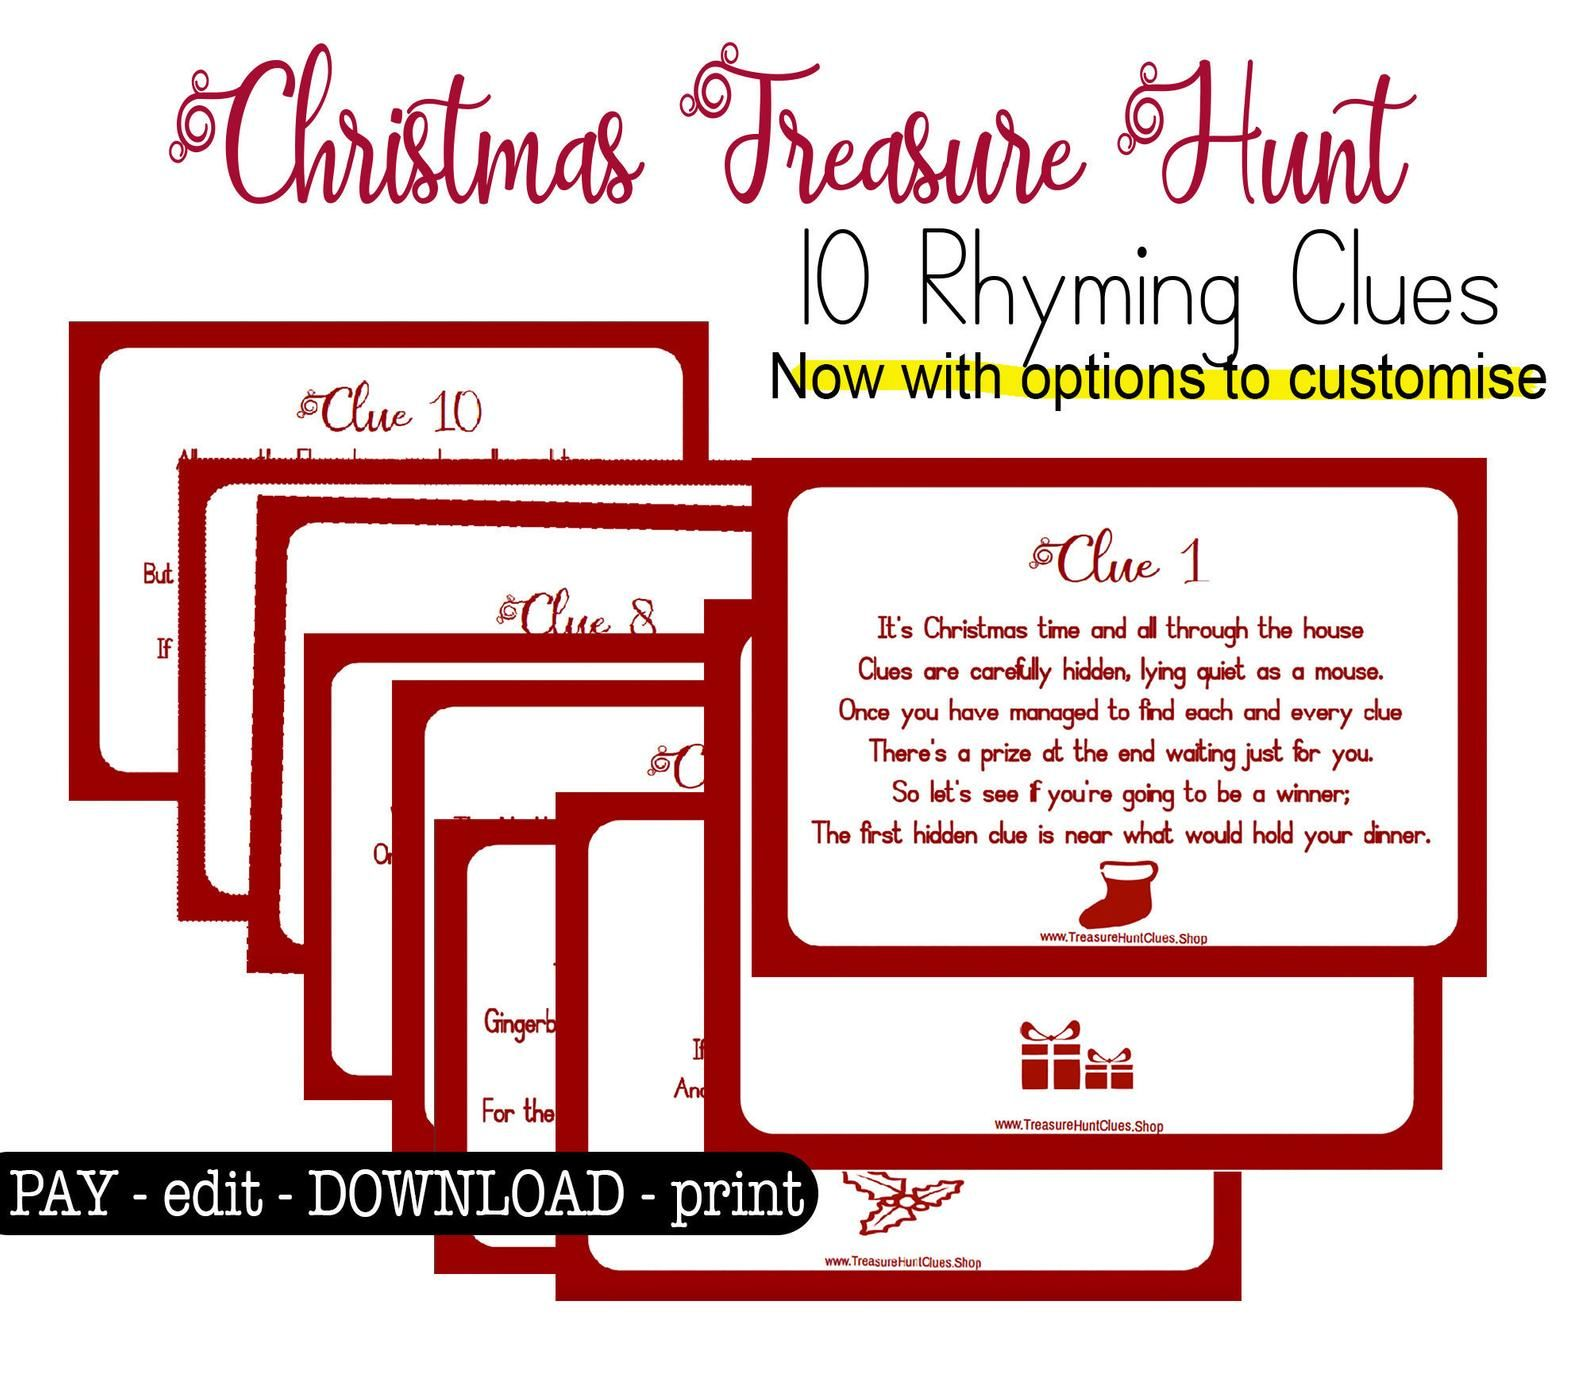 Indoor Christmas Treasure Hunt Clues Printable Scavenger